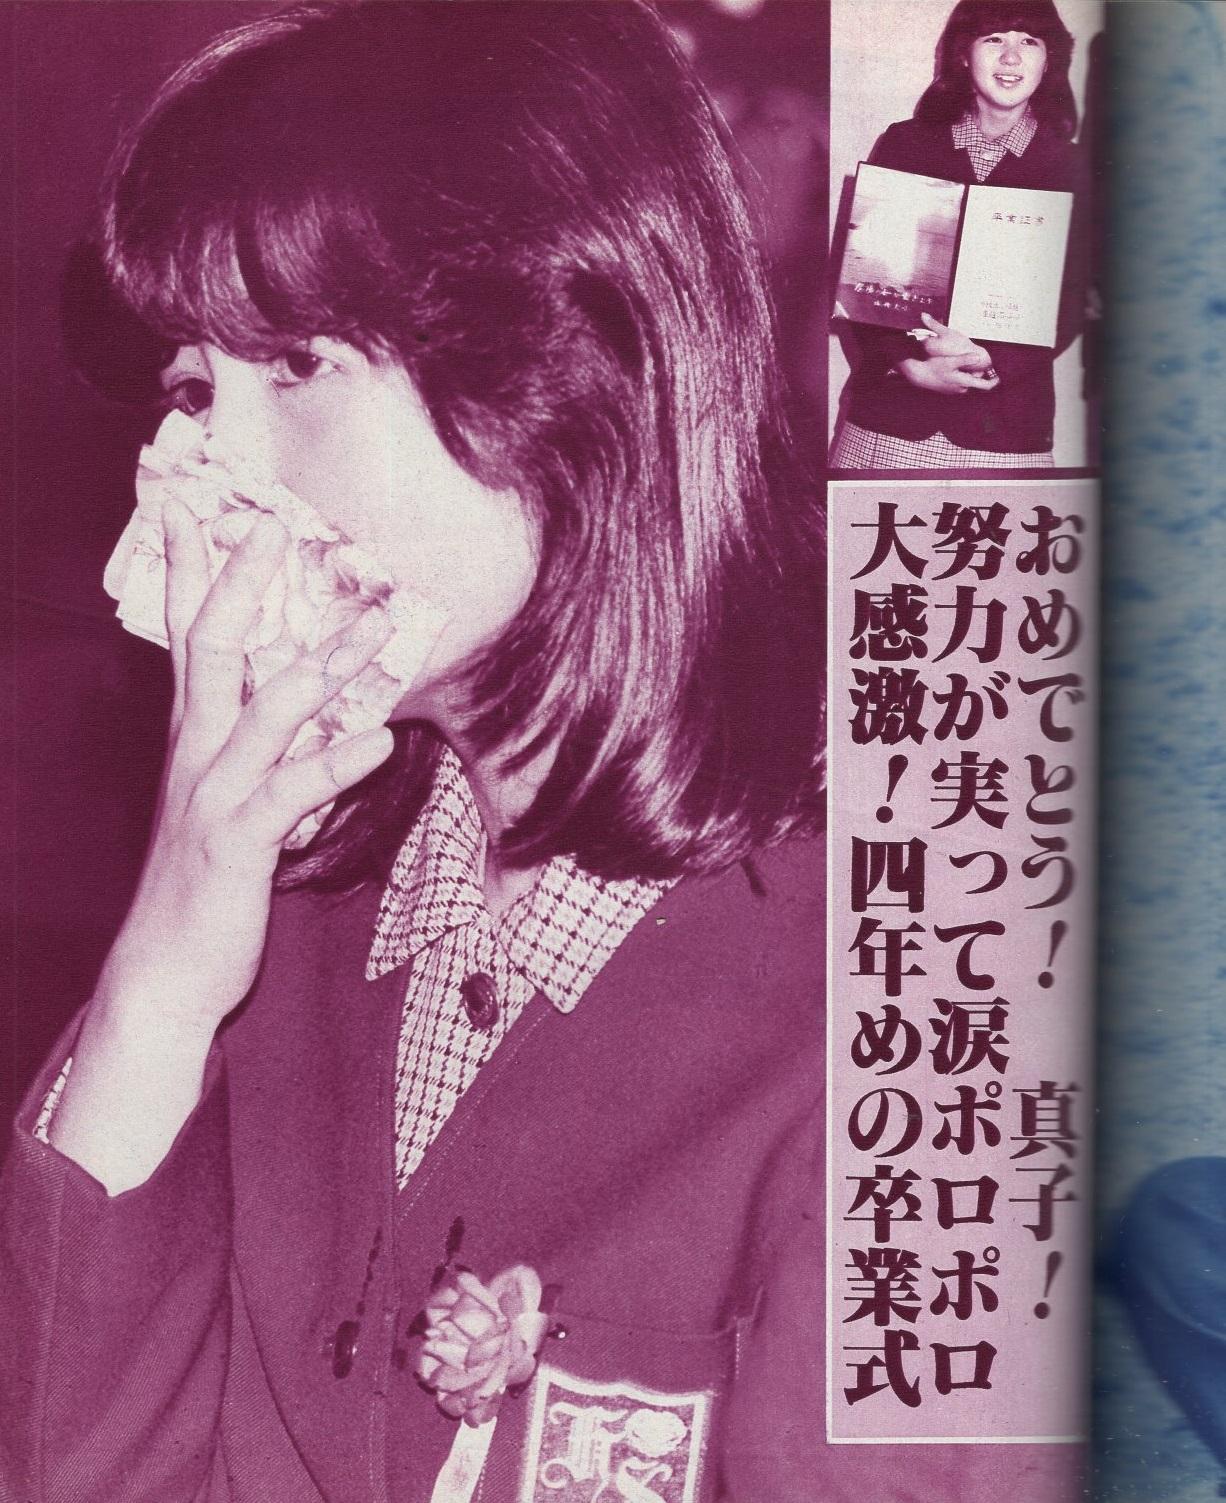 石野真子パート5特集号 近代映画ハロー昭和55年初夏号 古本 中古本 古書籍の通販は 日本の古本屋 日本の古本屋